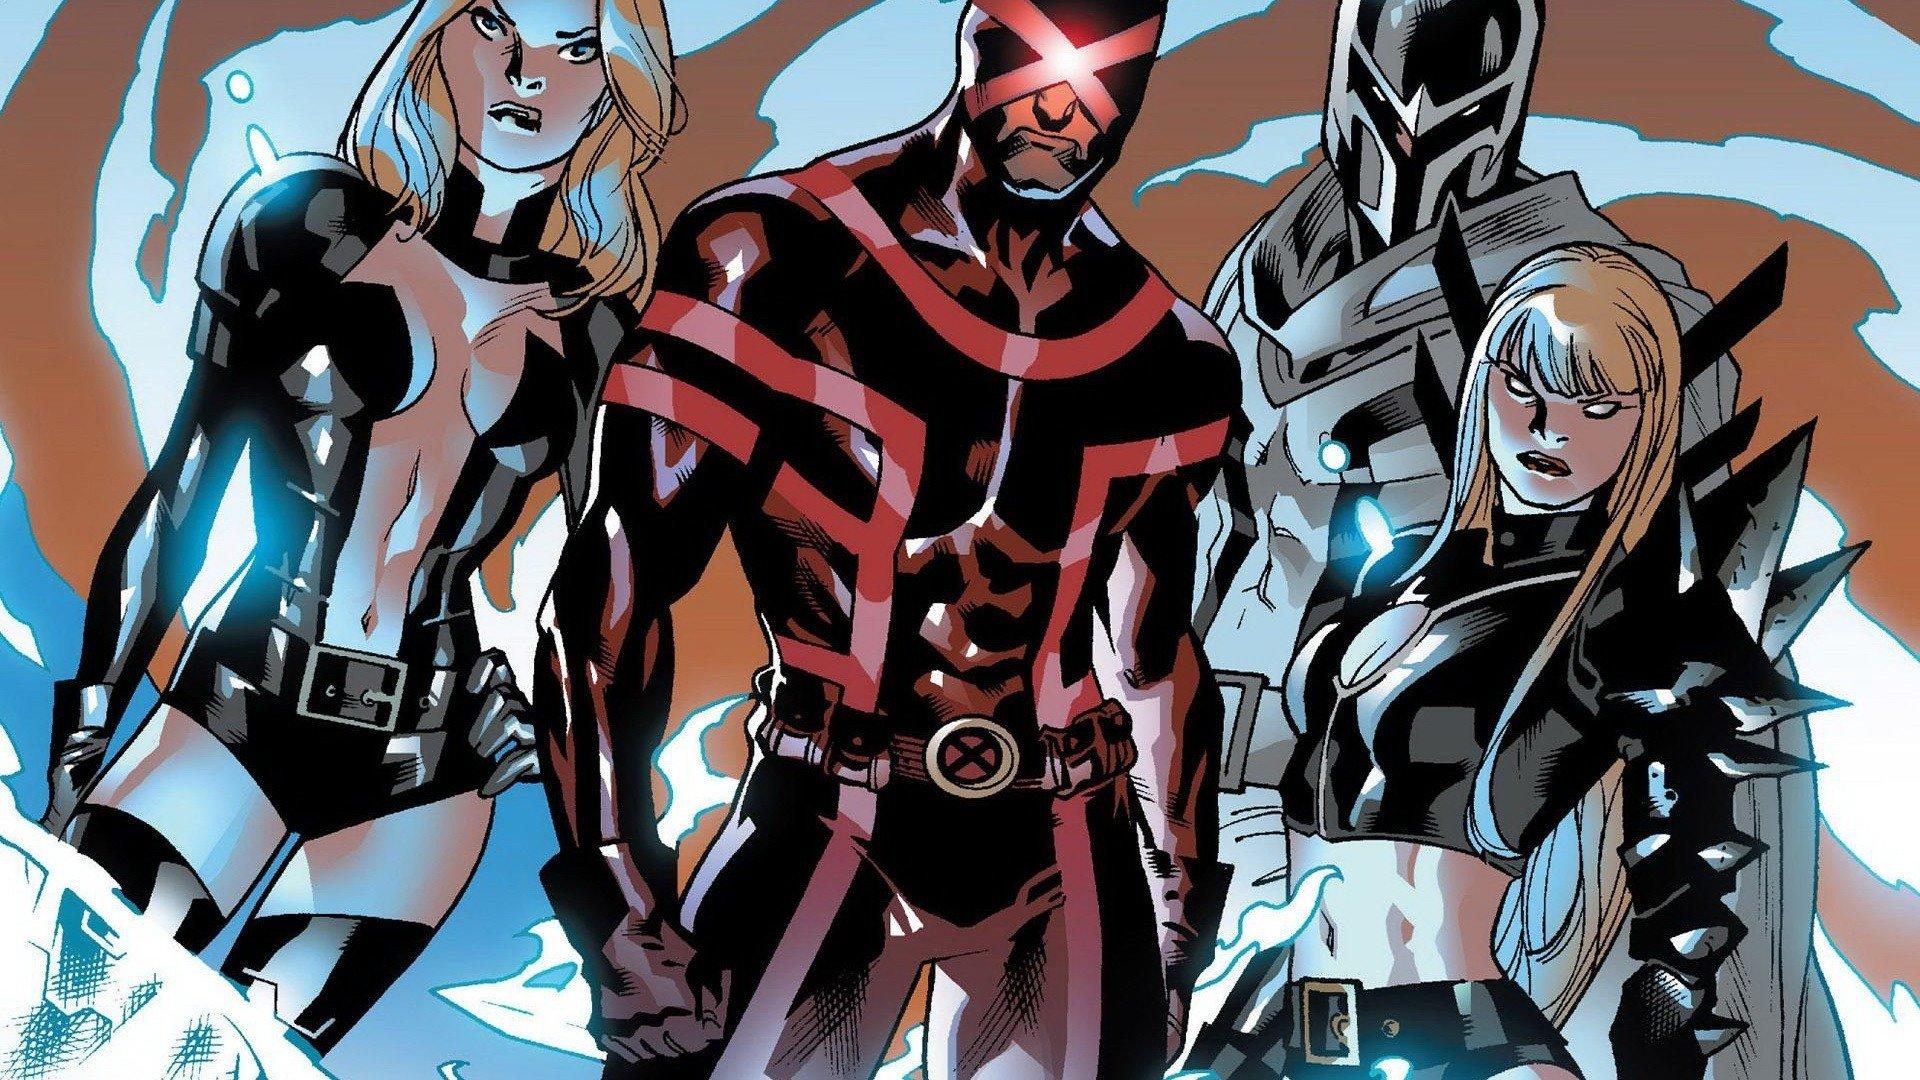 X-Men HD Wallpaper | Background Image | 1920x1080 | ID ...